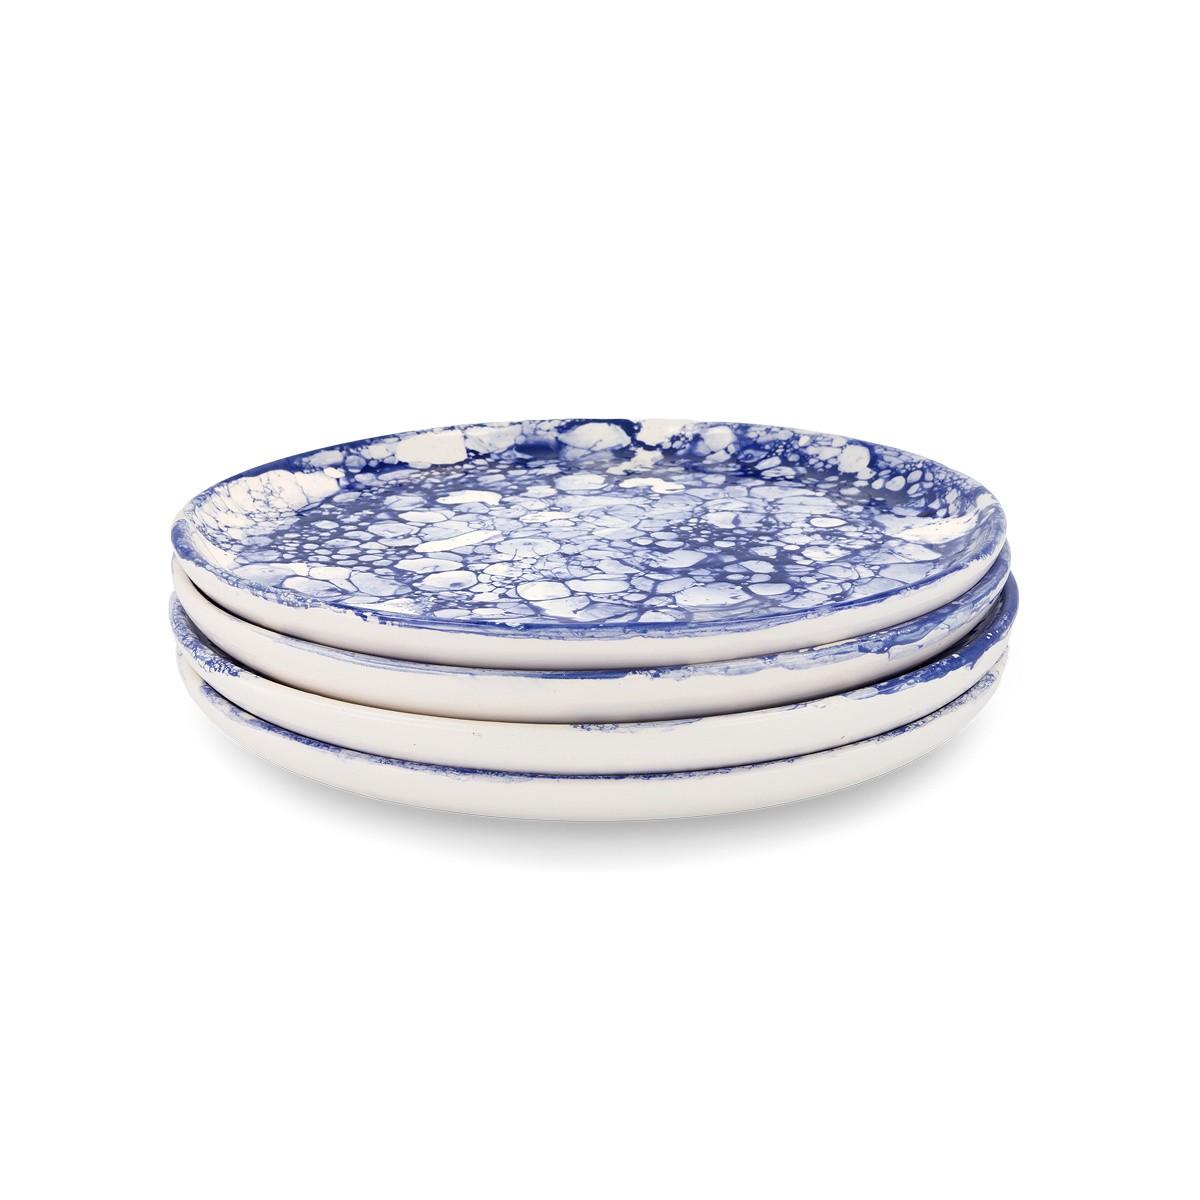 4 Blue Bolle Dinner Plates